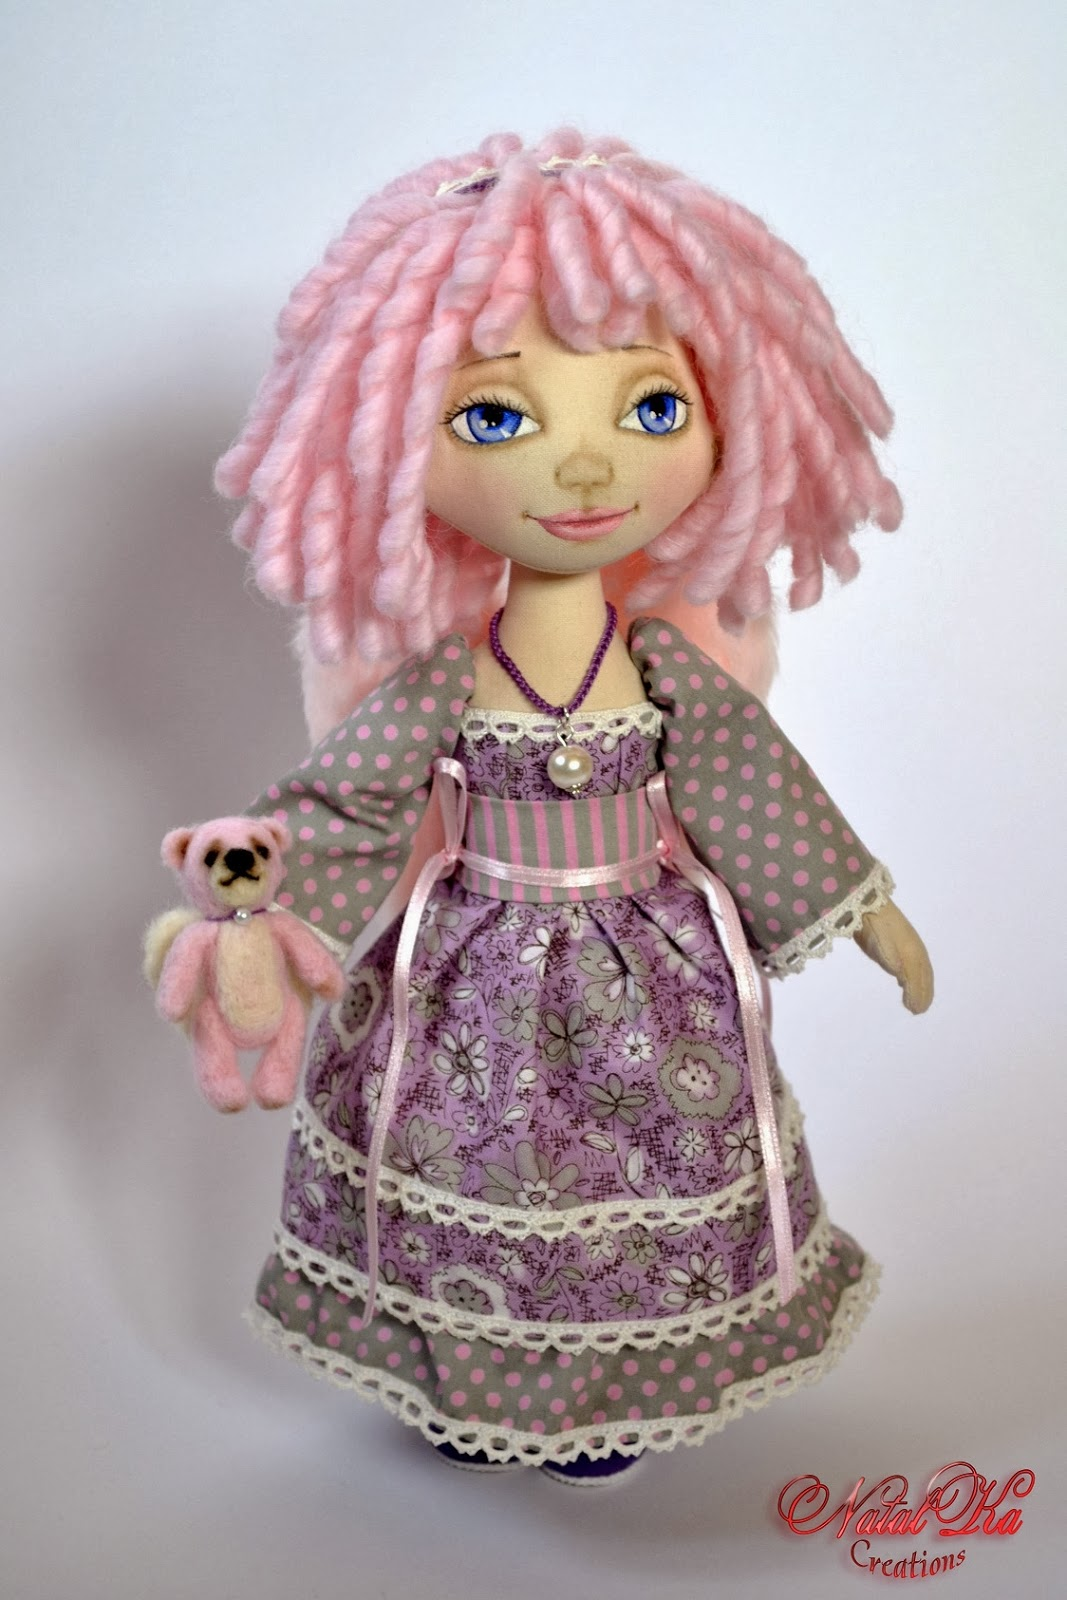 Авторская текстильная кукла тряпичная кукла ангел ручной работы от Natalka Creations. Cloth art fabric rag doll angel art doll handmade by NatalKa Creations